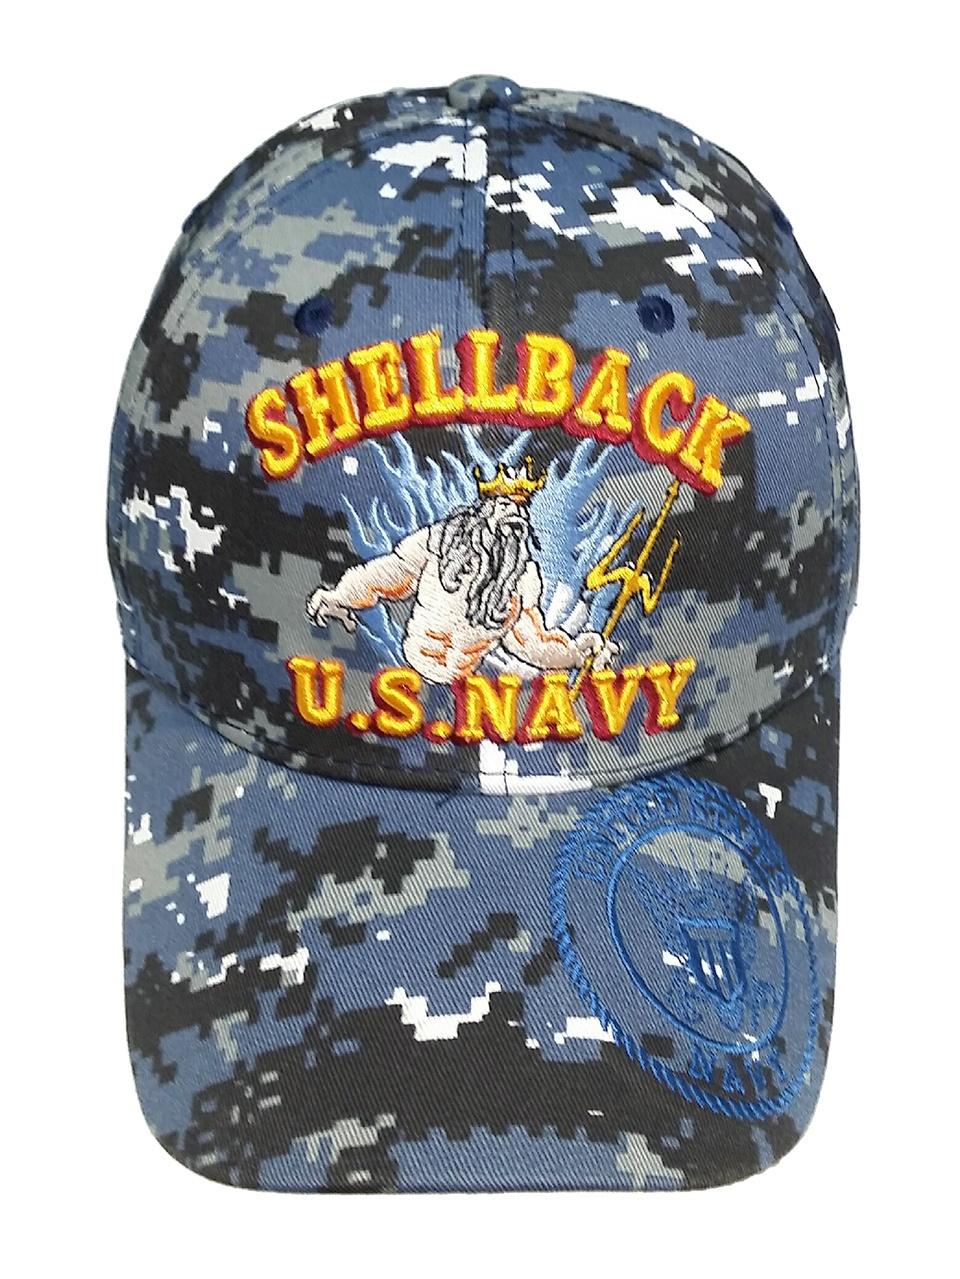 8e2962cecc796 usa navy blue camo hat 3a17c 4aa9a